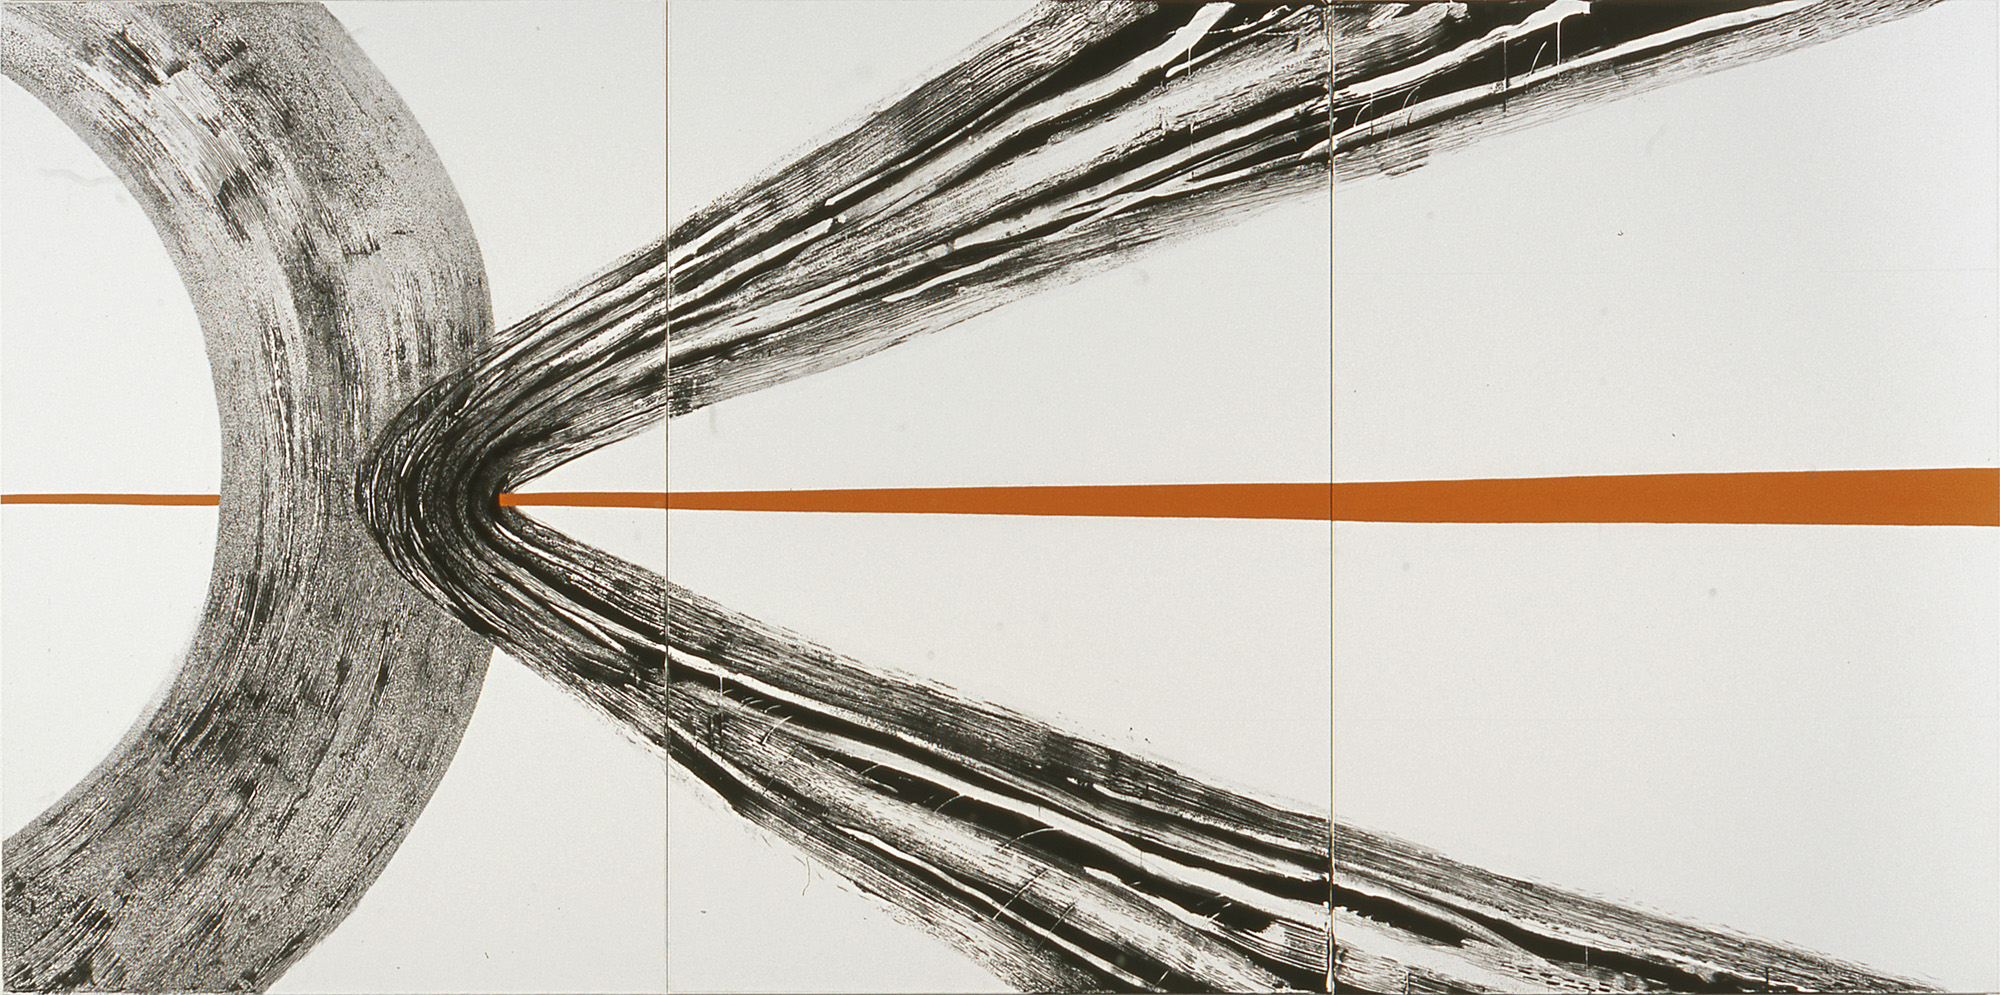 Gnist - 180x360 cm, tusj/penn/pensel/voks og akryl på bomulls/polyesterstoff